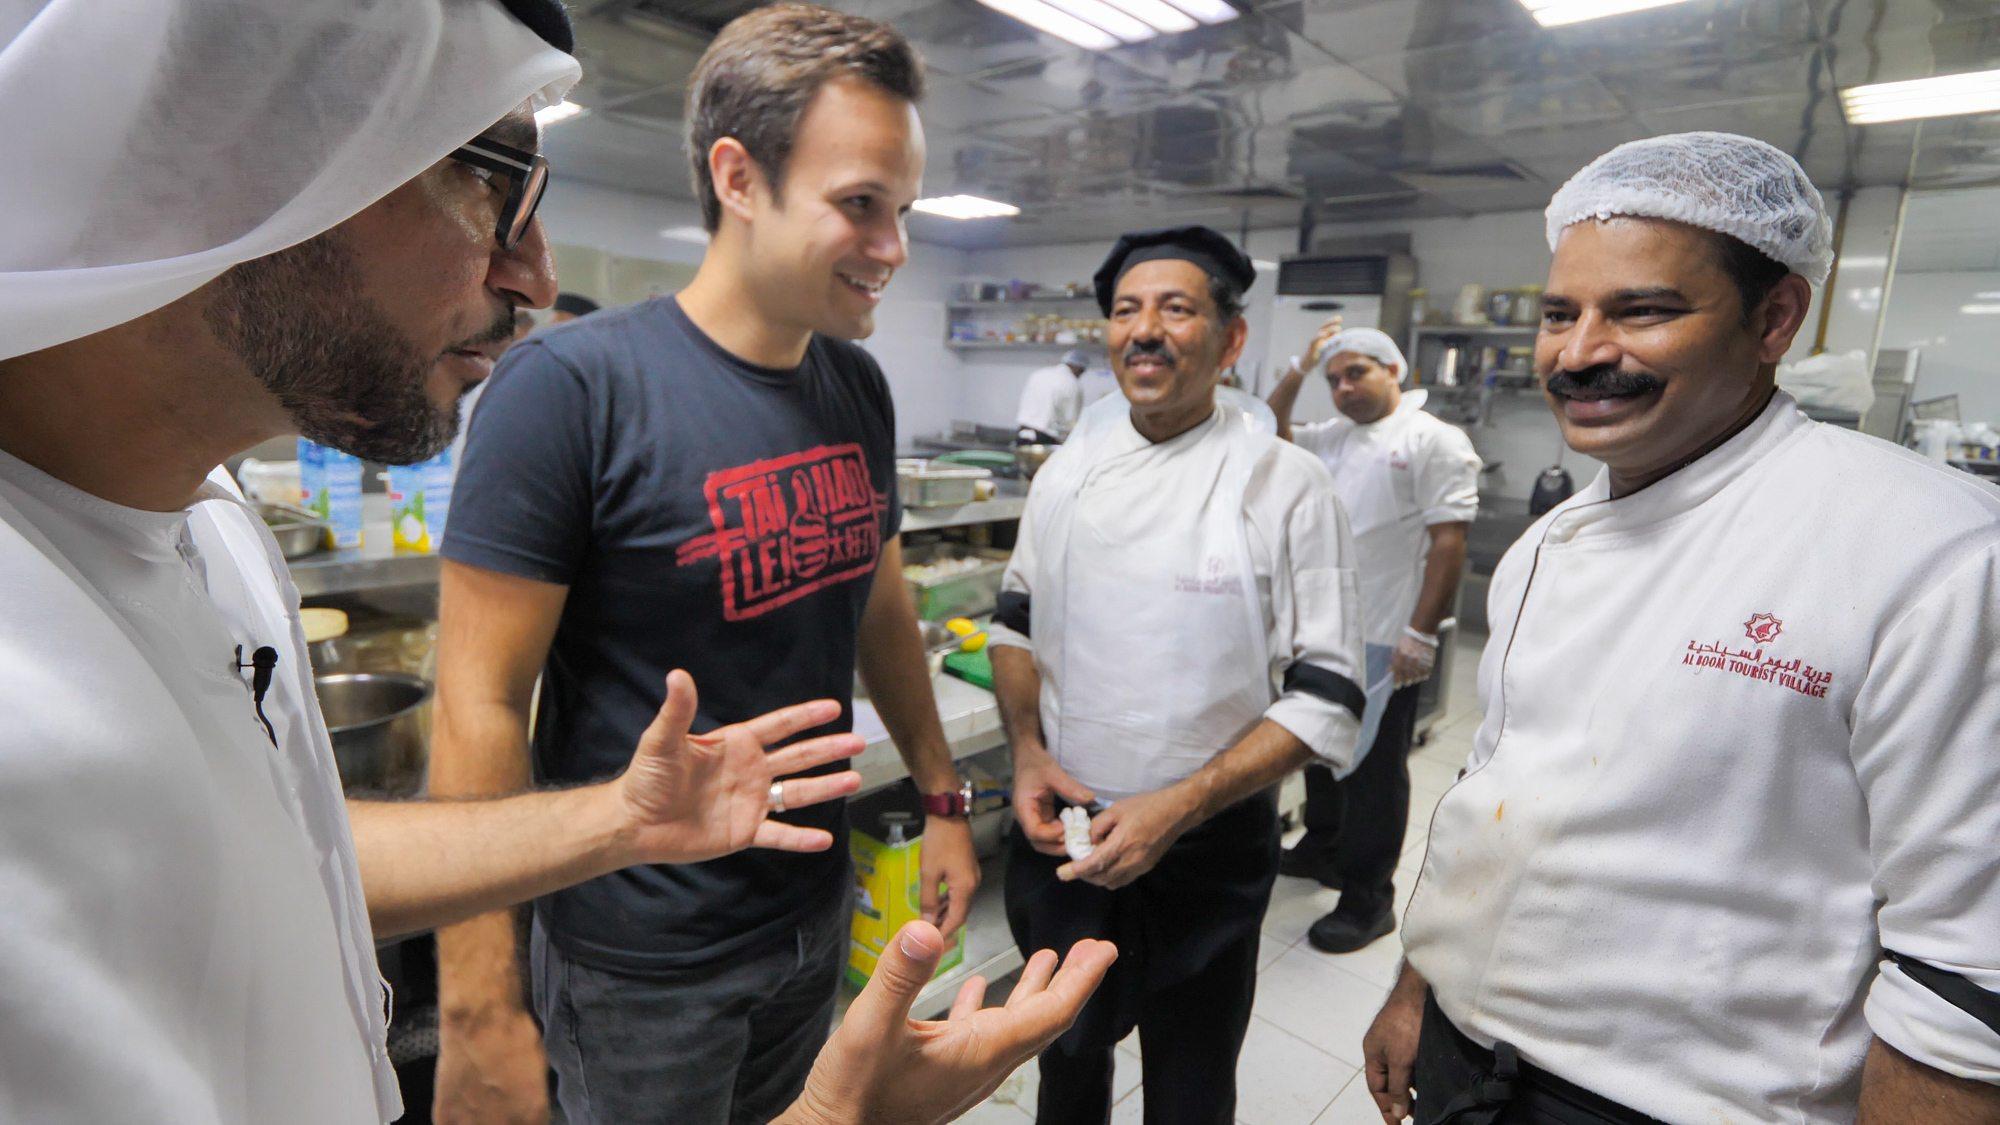 Meeting the chefs at zaman awal restaurant